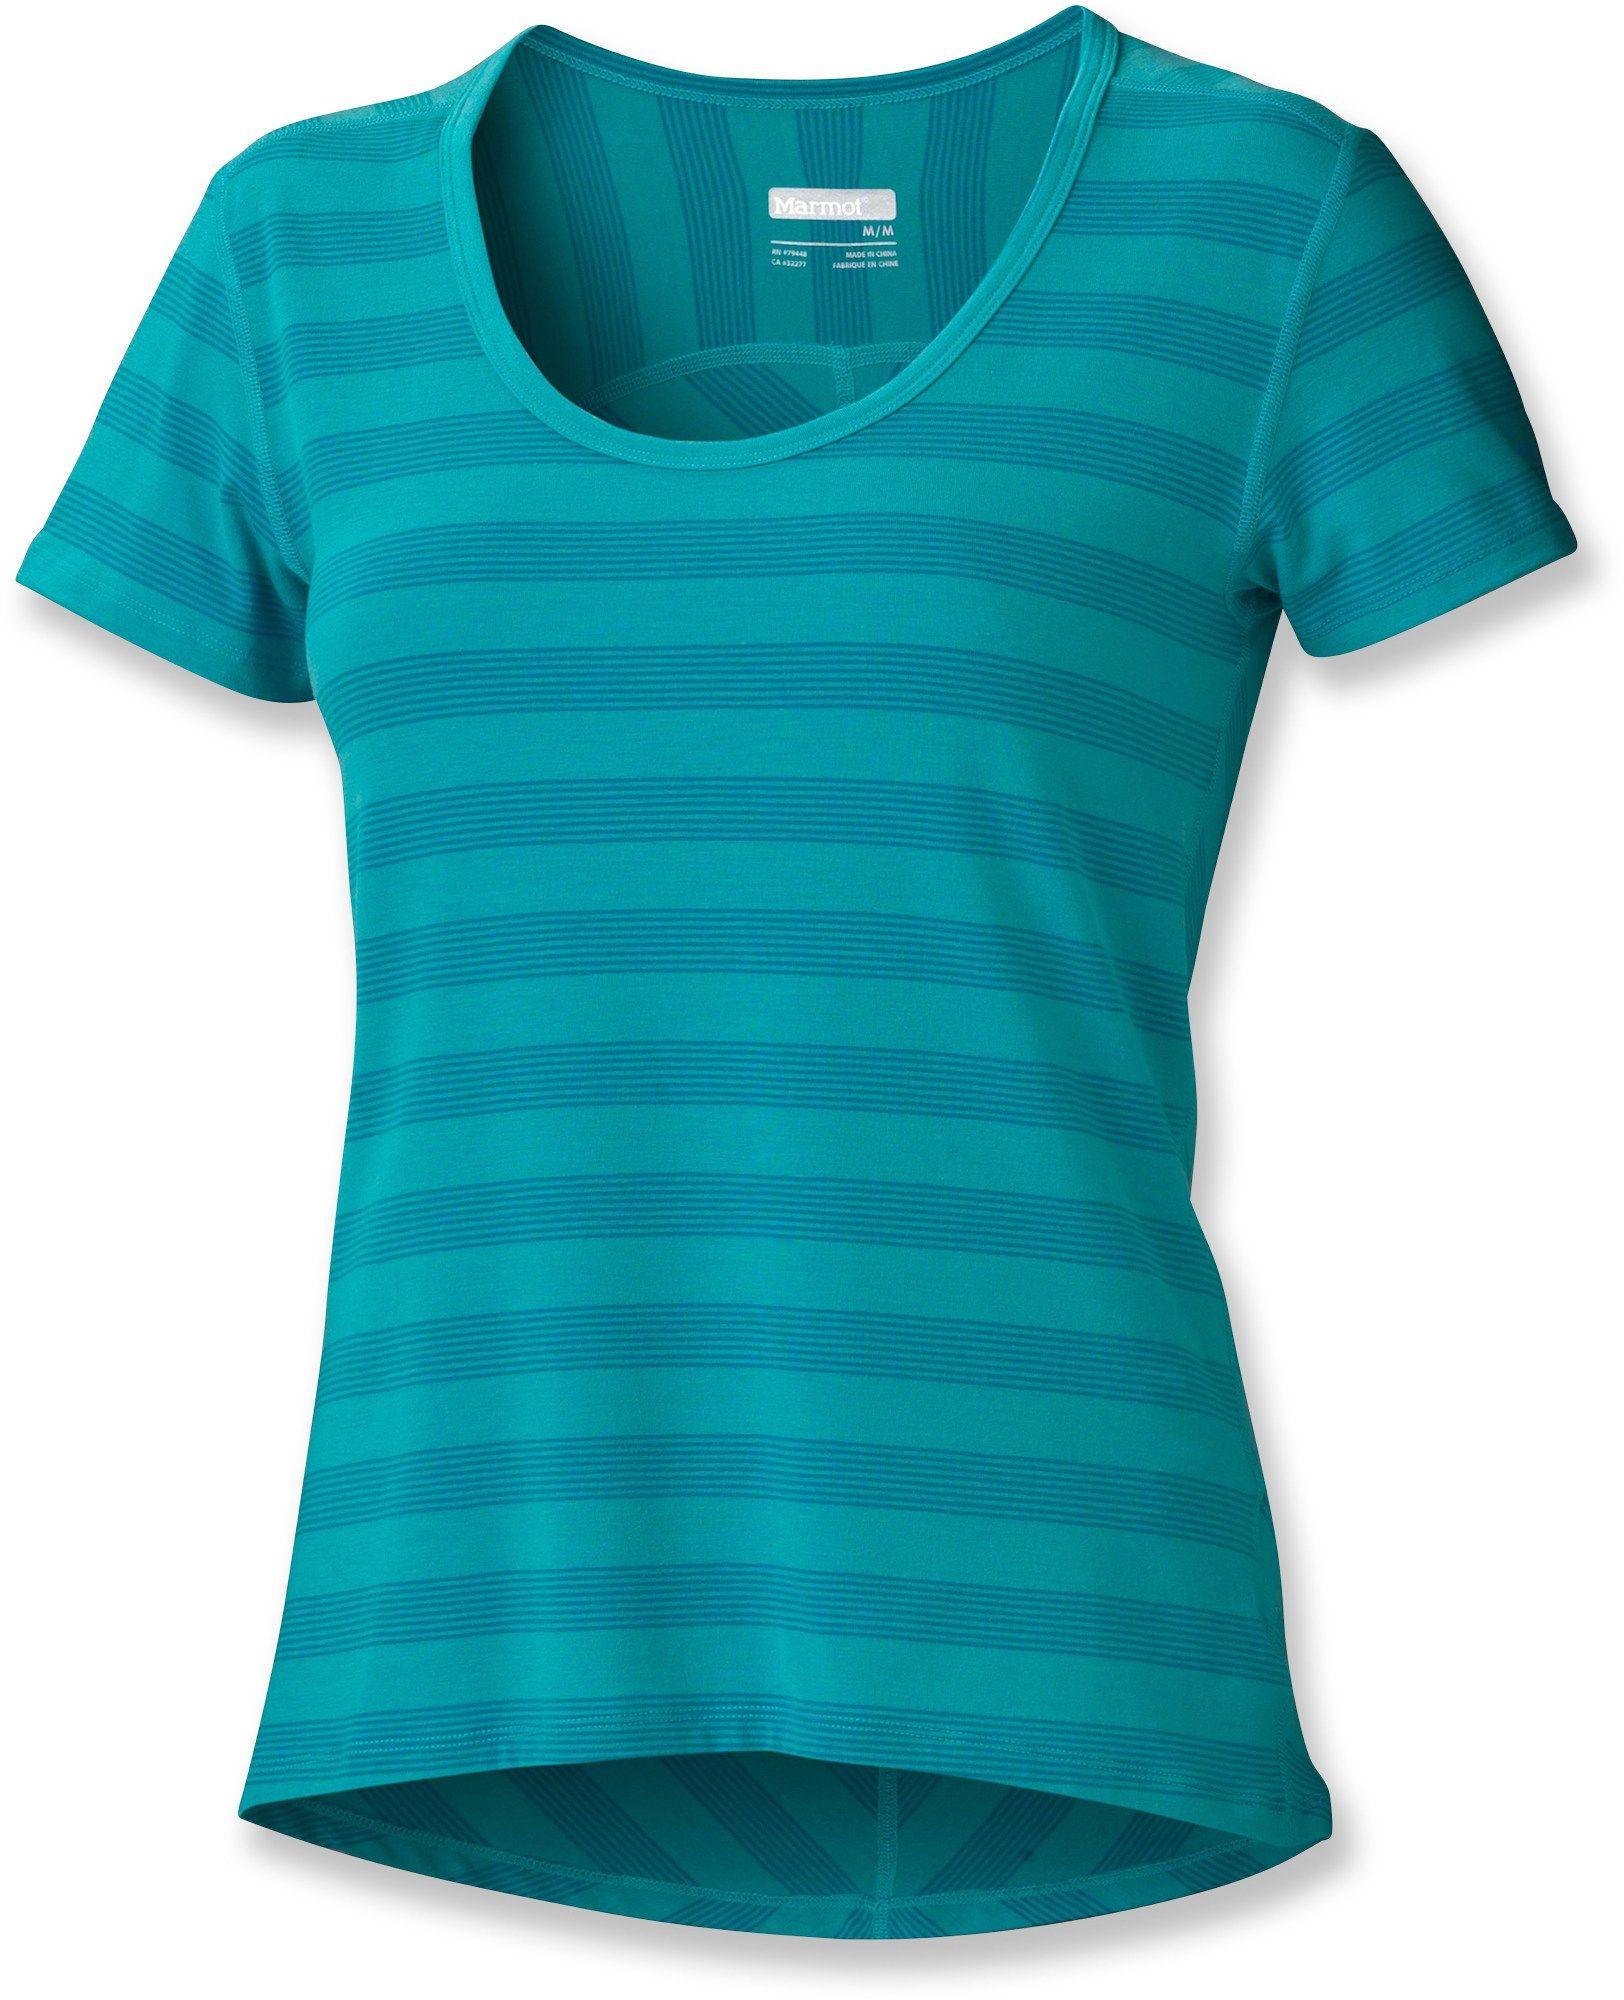 http://www.rei.com/product/864666/marmot-ameila-shirt-womens